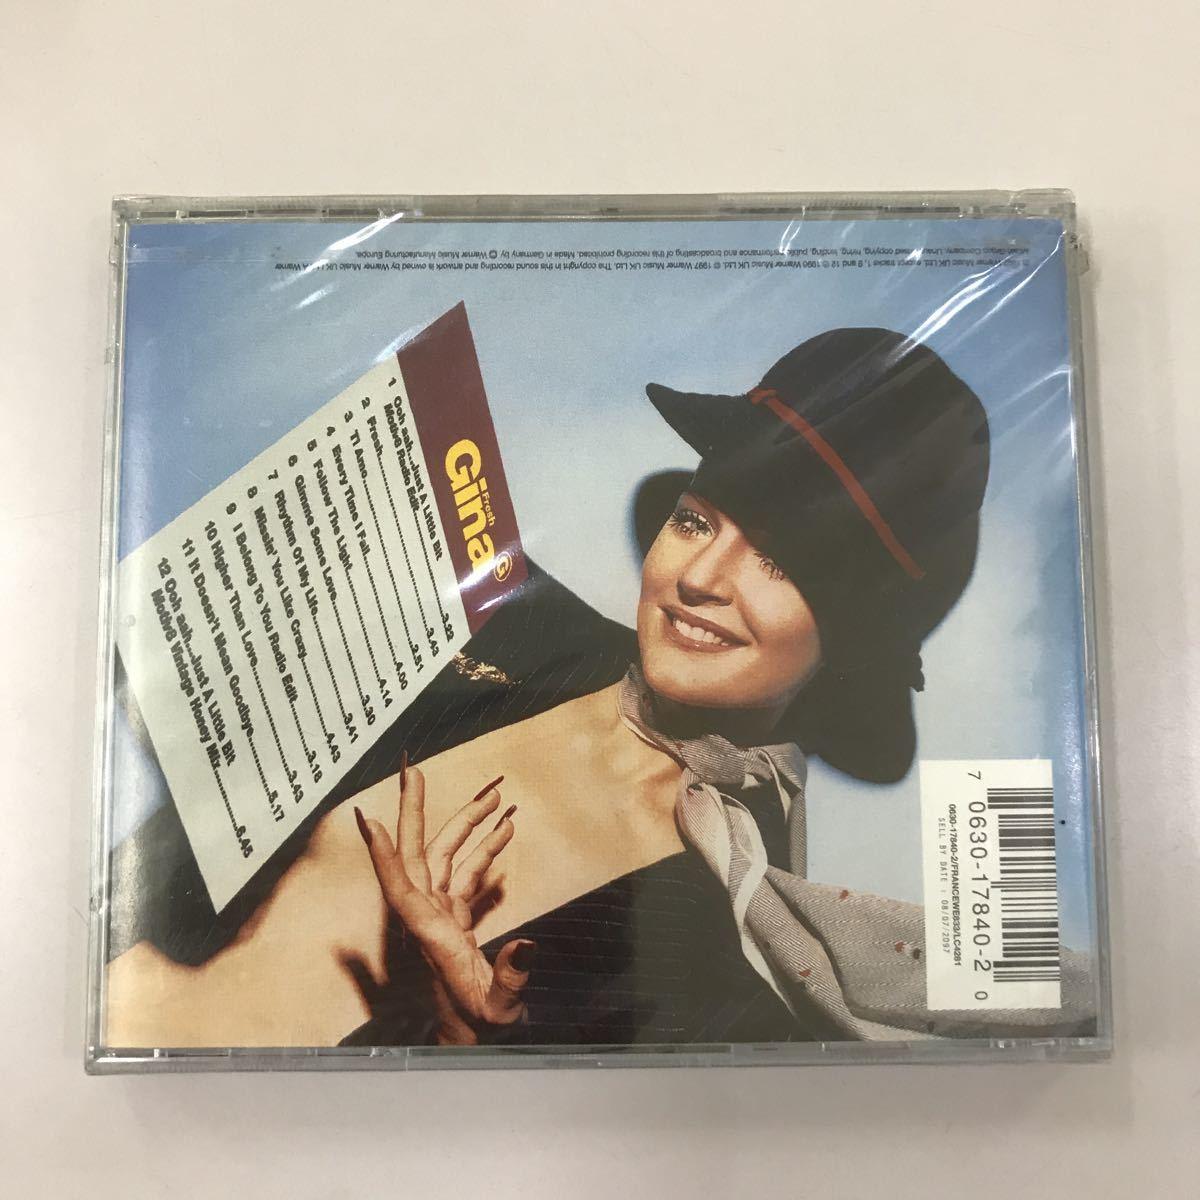 CD 未開封【洋楽】長期保存品 Gina G Fresh!